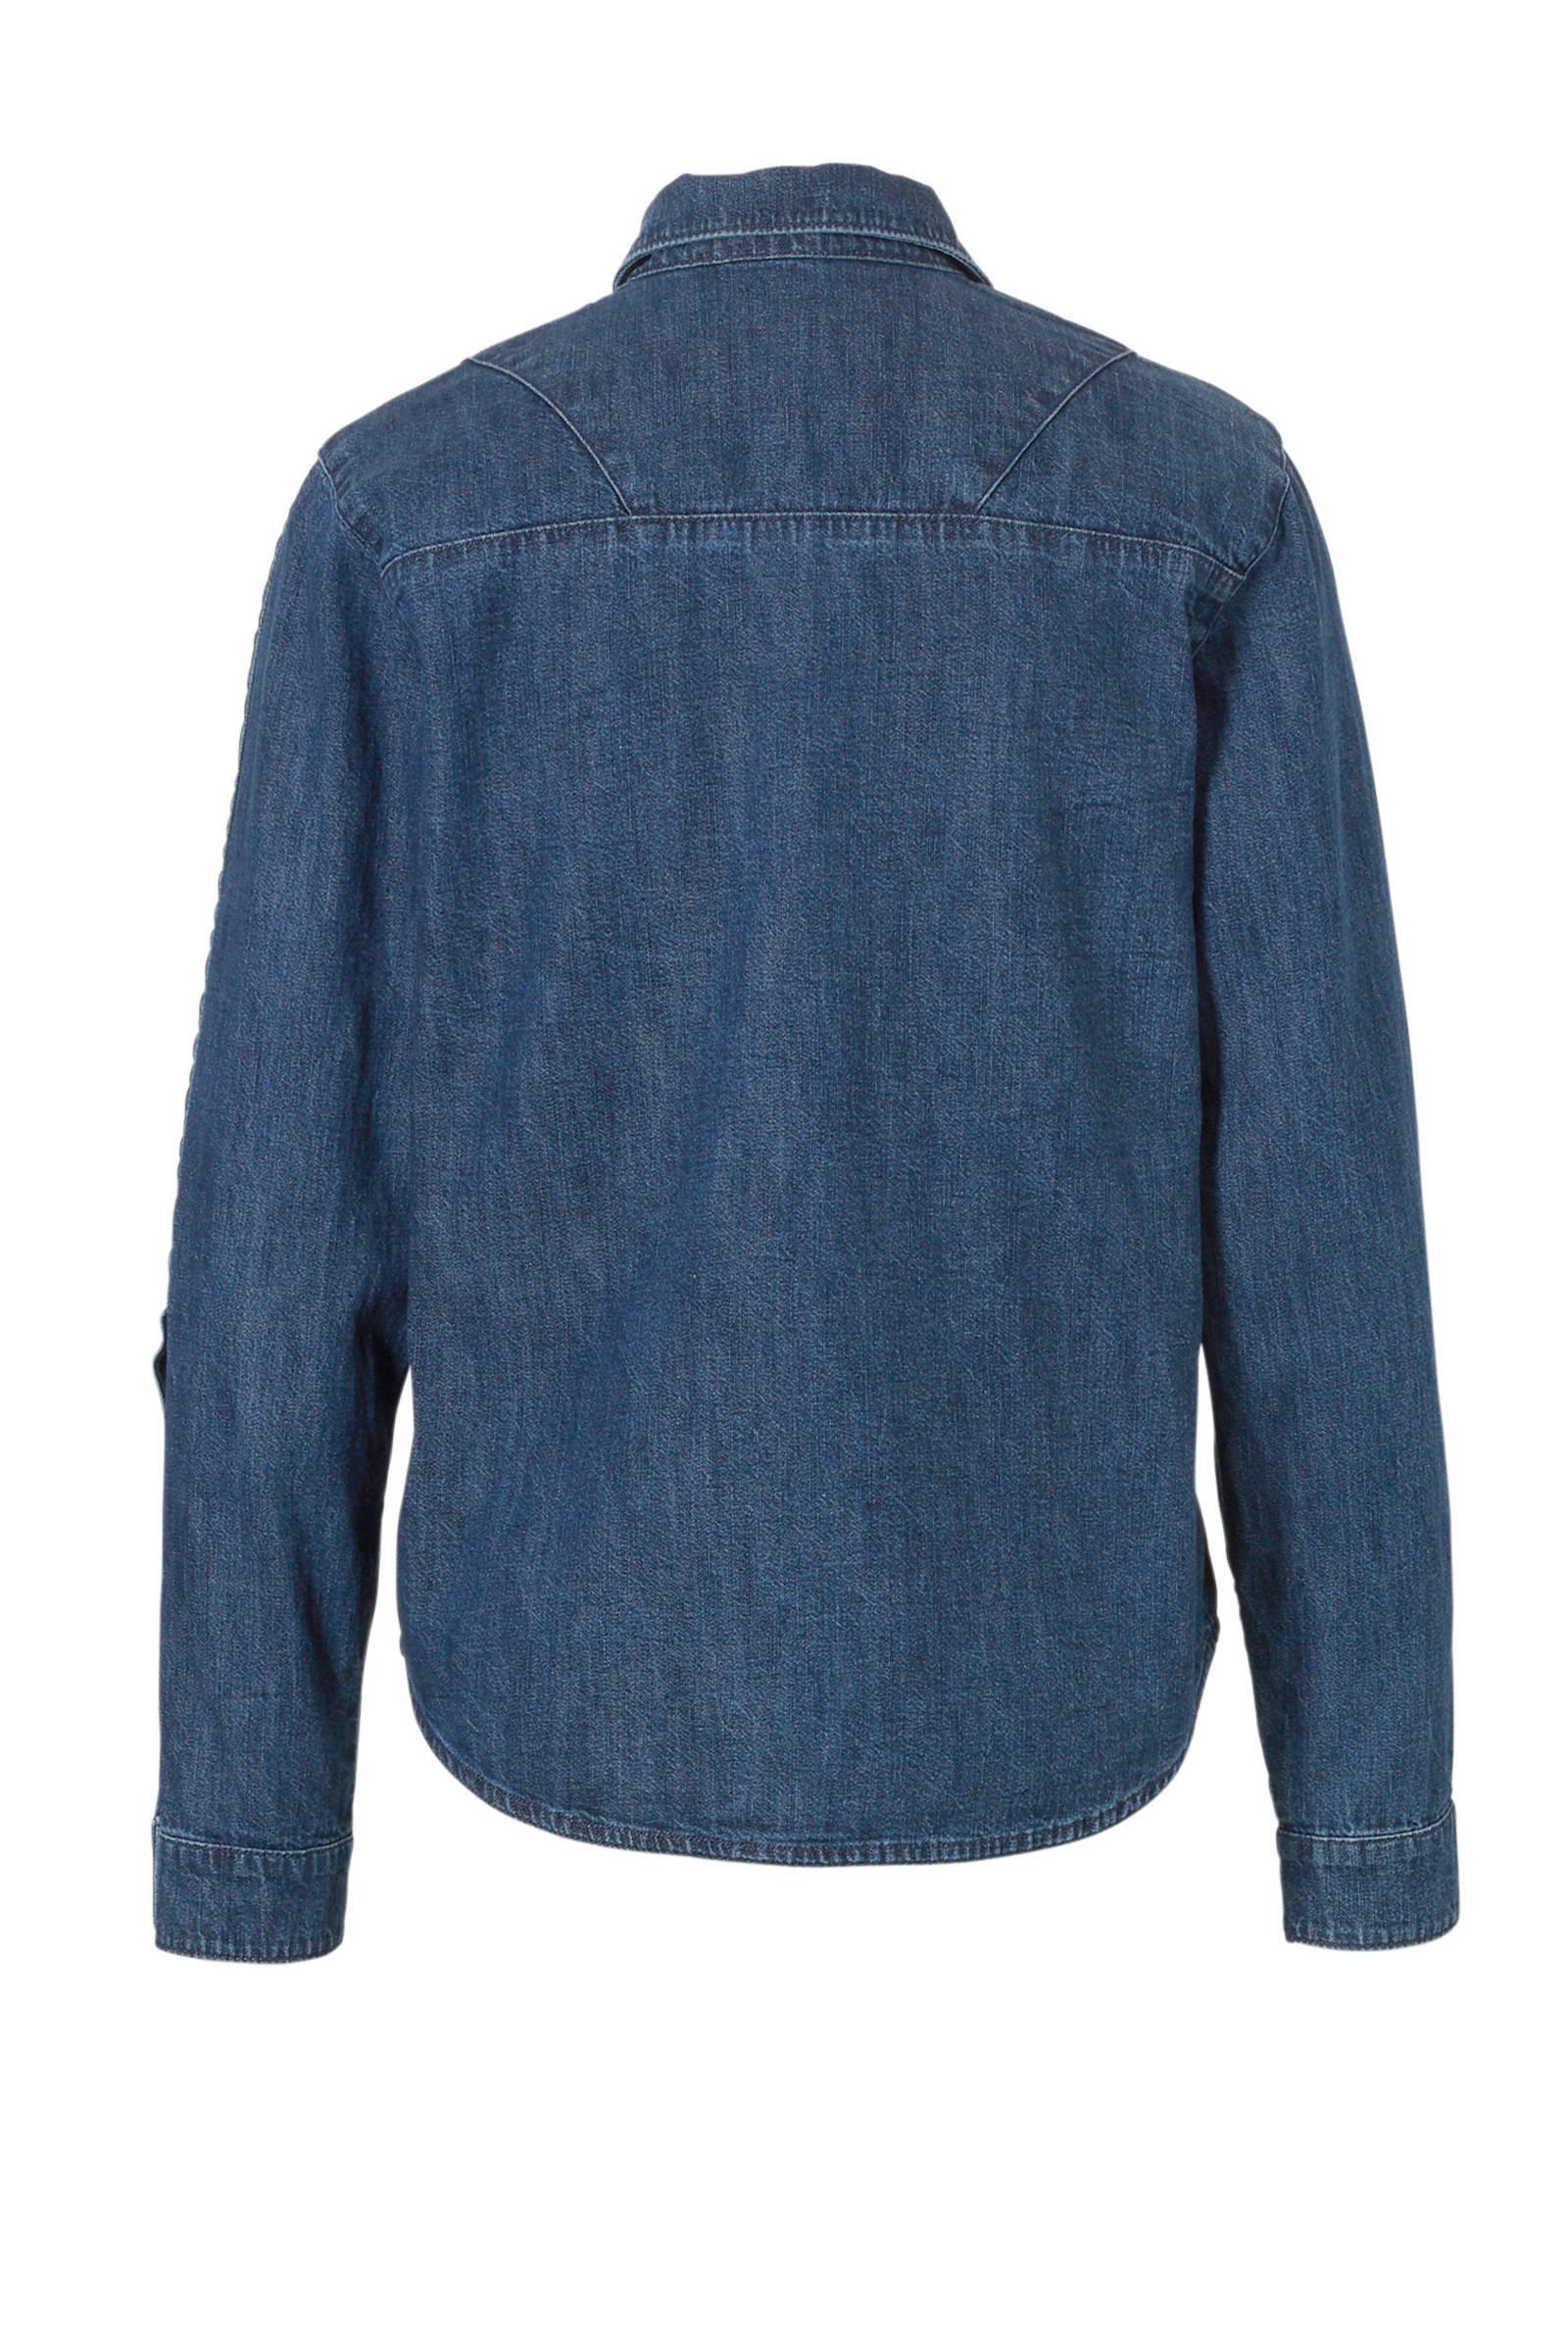 Women ESPRIT blouse spijker ESPRIT edc edc Women aqwSdaz